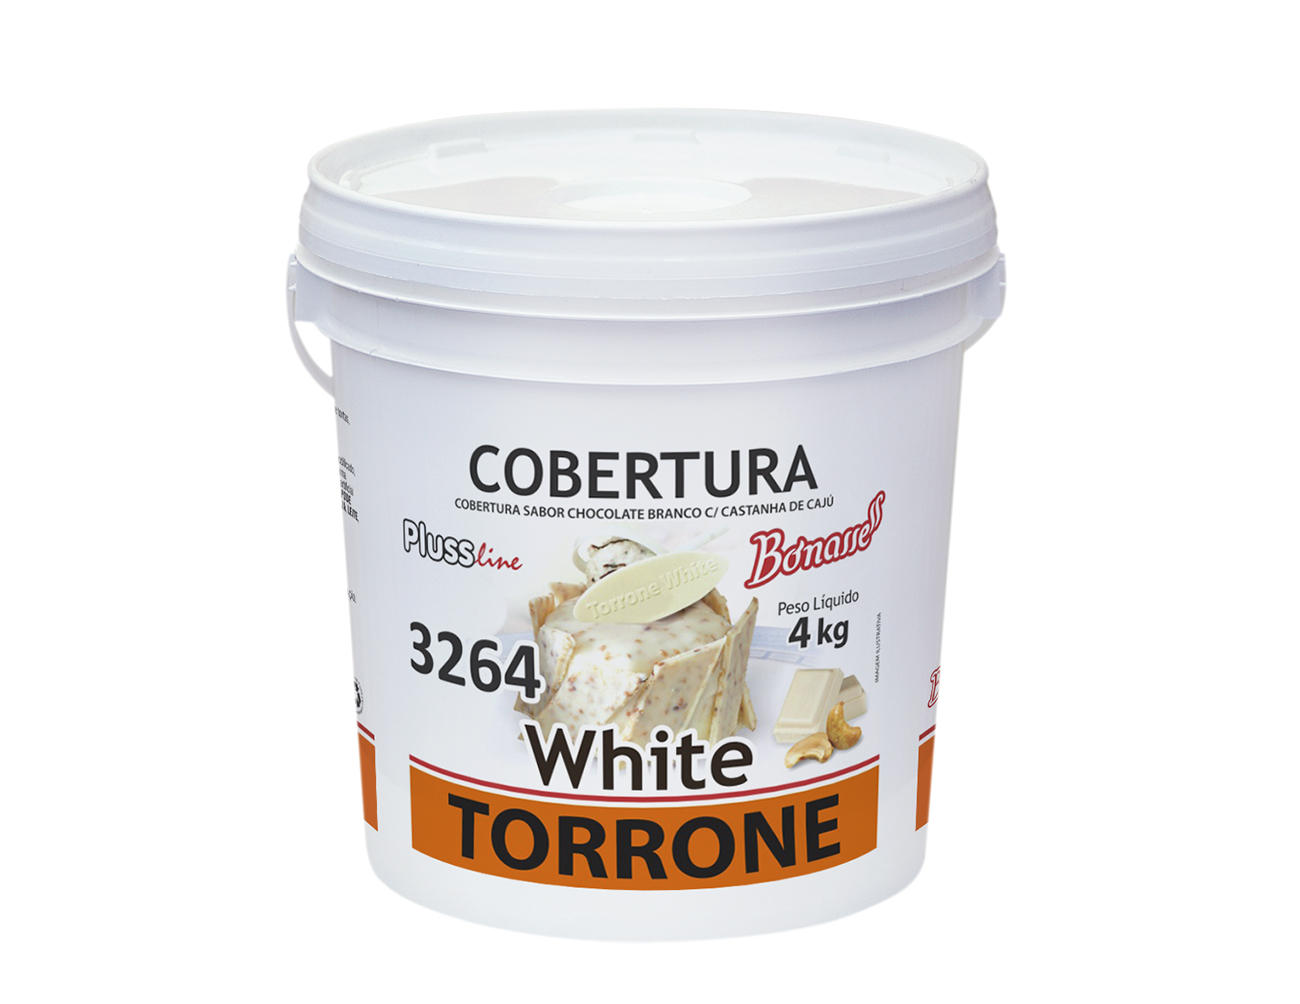 Cobertura Torrone White